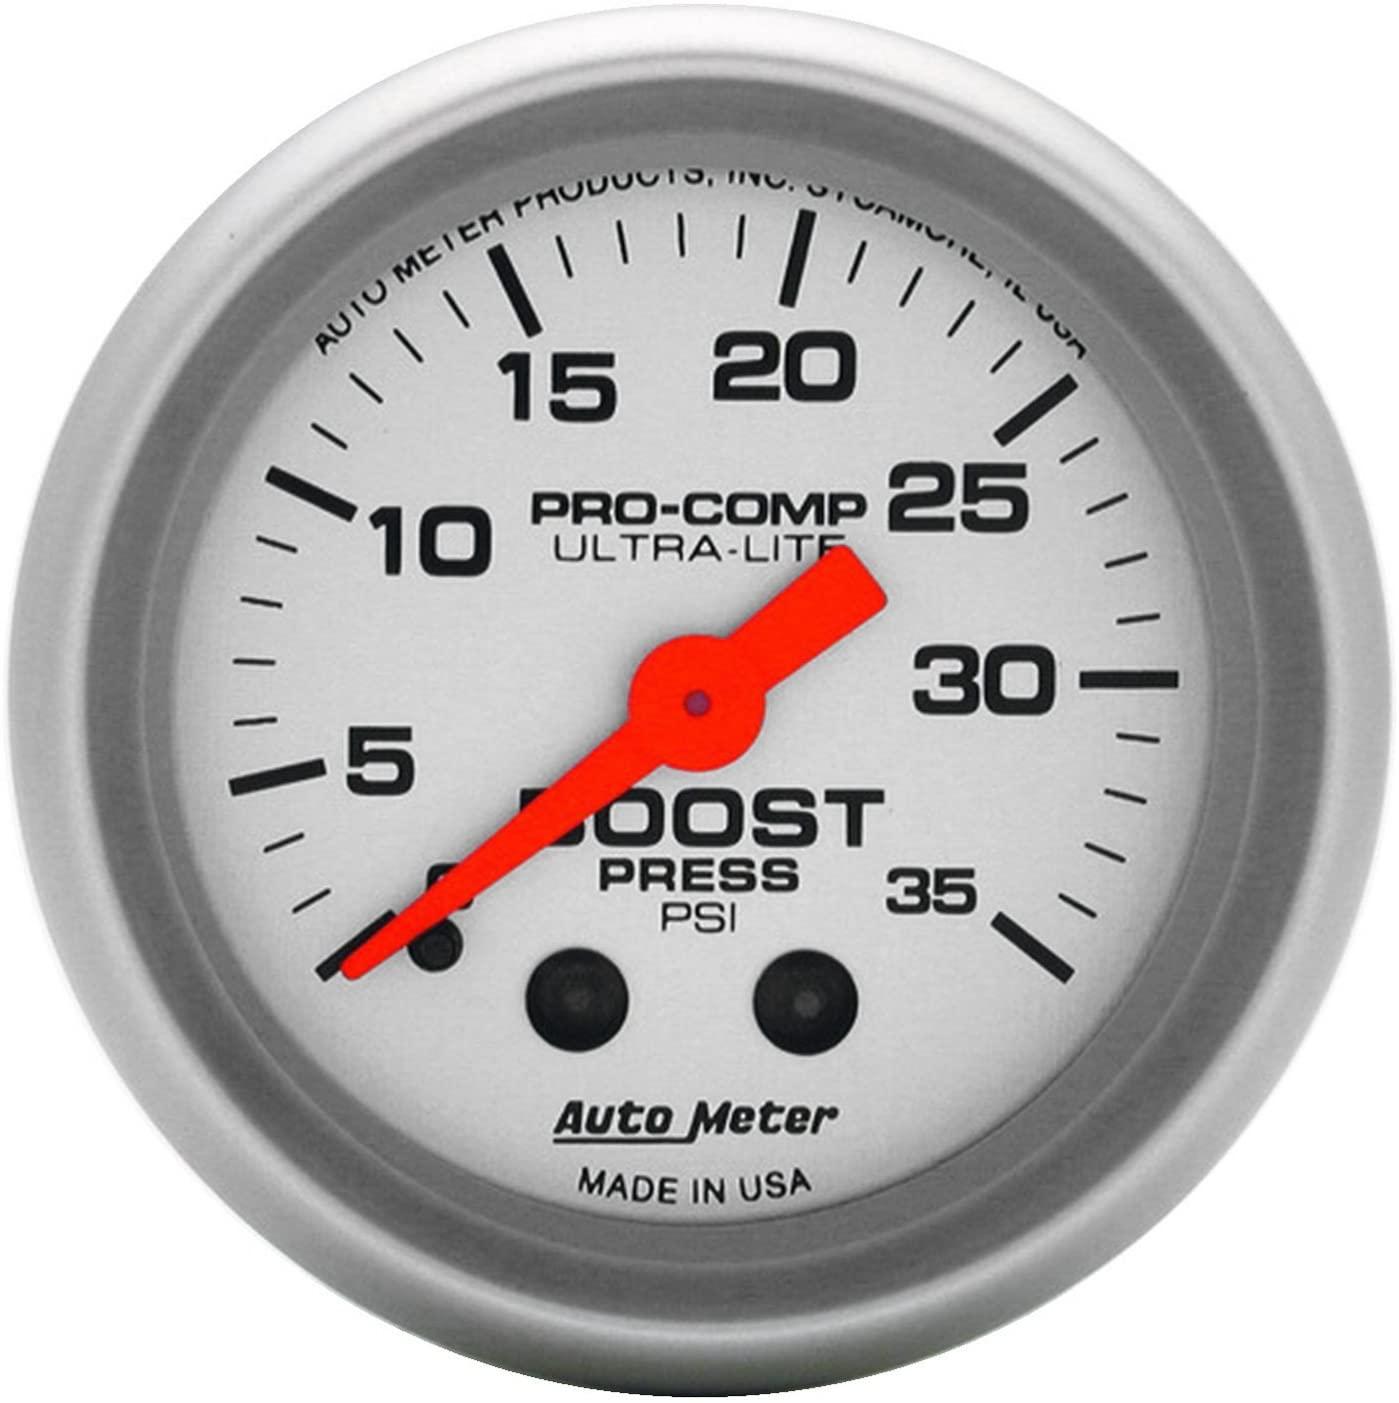 Auto Meter 4304 Ultra-Lite Mechanical Boost Gauge